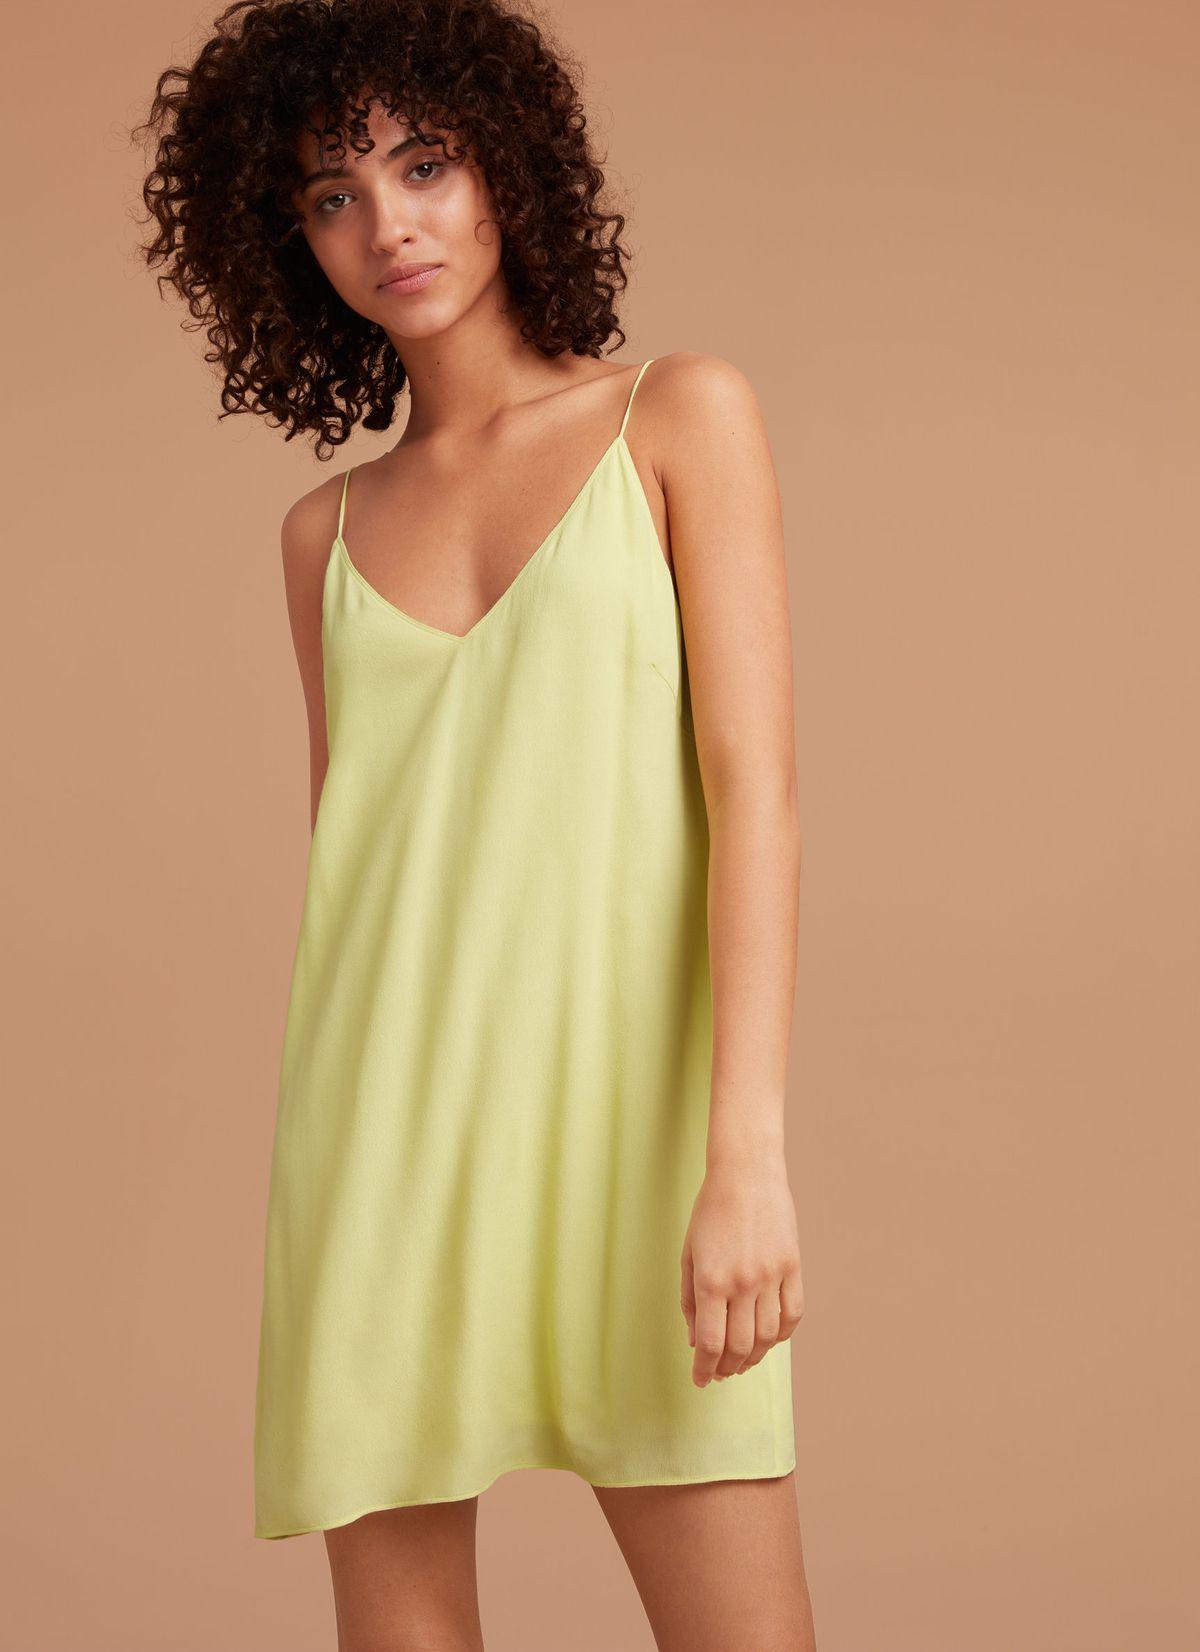 a model wearing a yellow slip dress